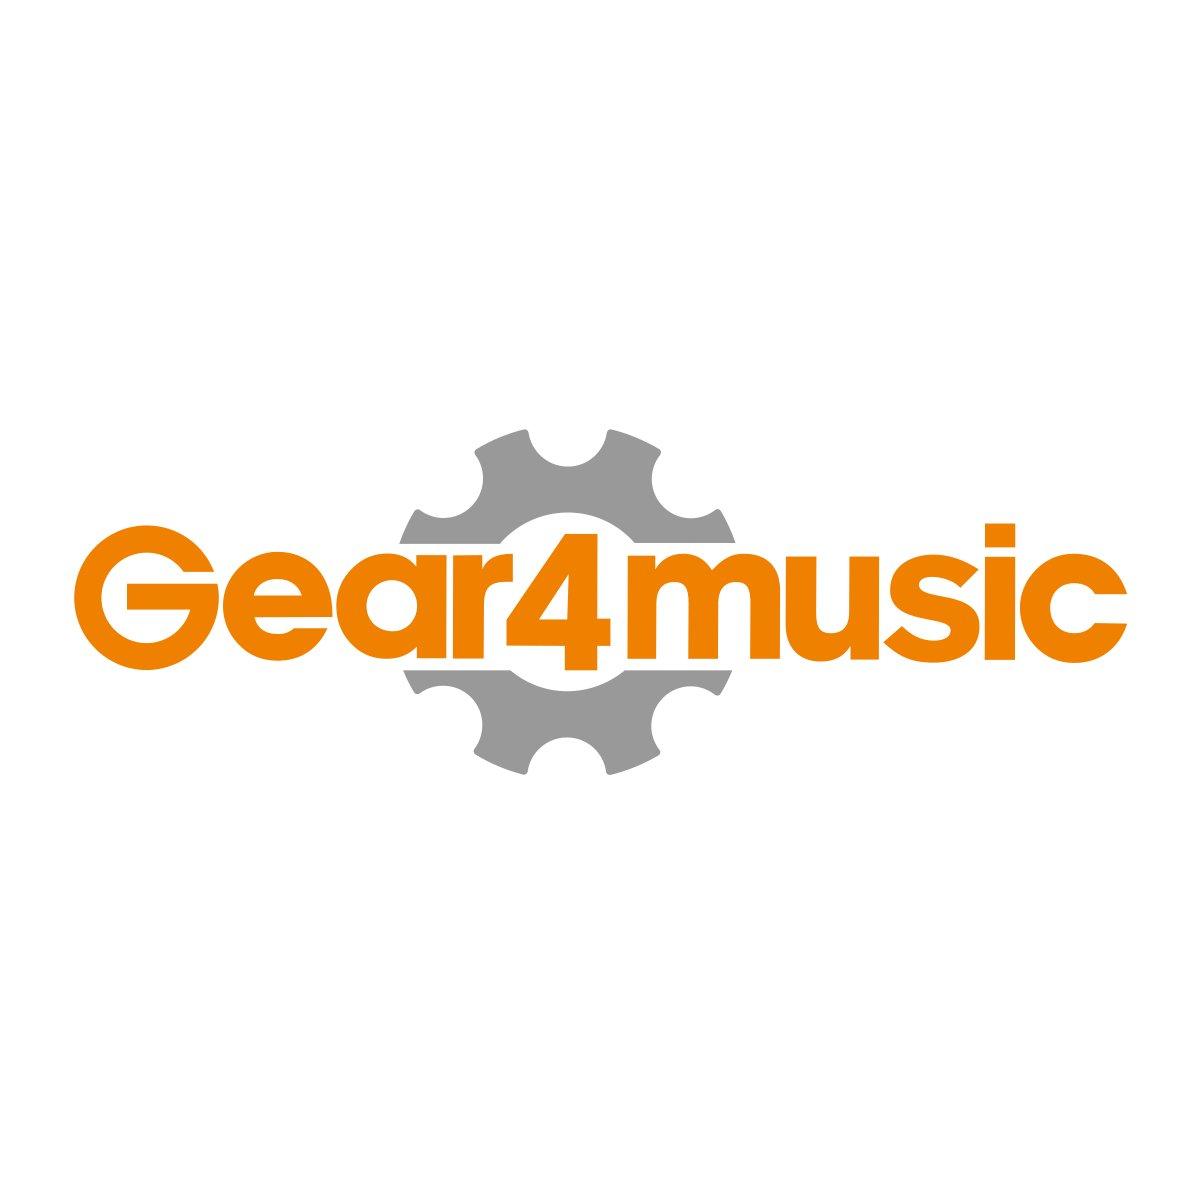 roland aira tr 8 rhythm performer at gear4music. Black Bedroom Furniture Sets. Home Design Ideas